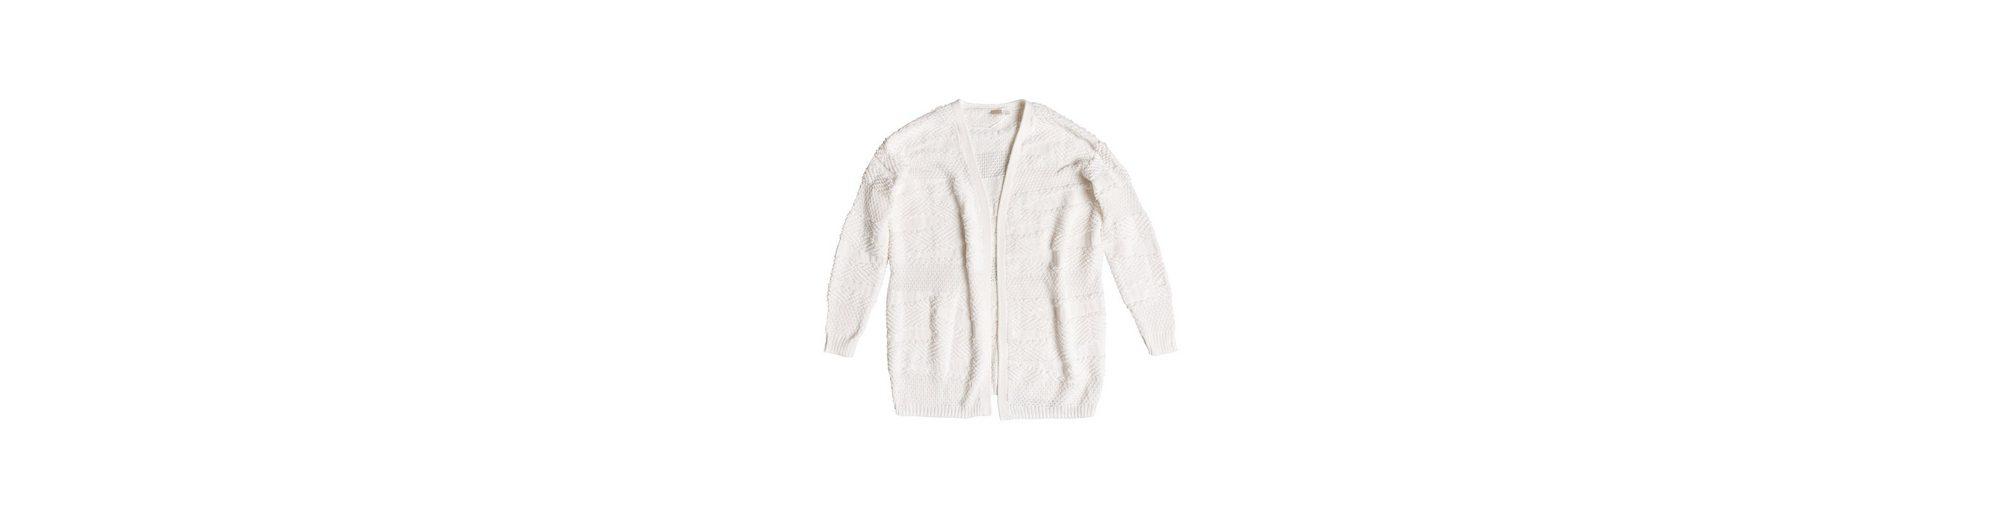 Roxy Cardigan Magnolia Sky Billig Verkauf Aus Deutschland Schlussverkauf FTEj7I